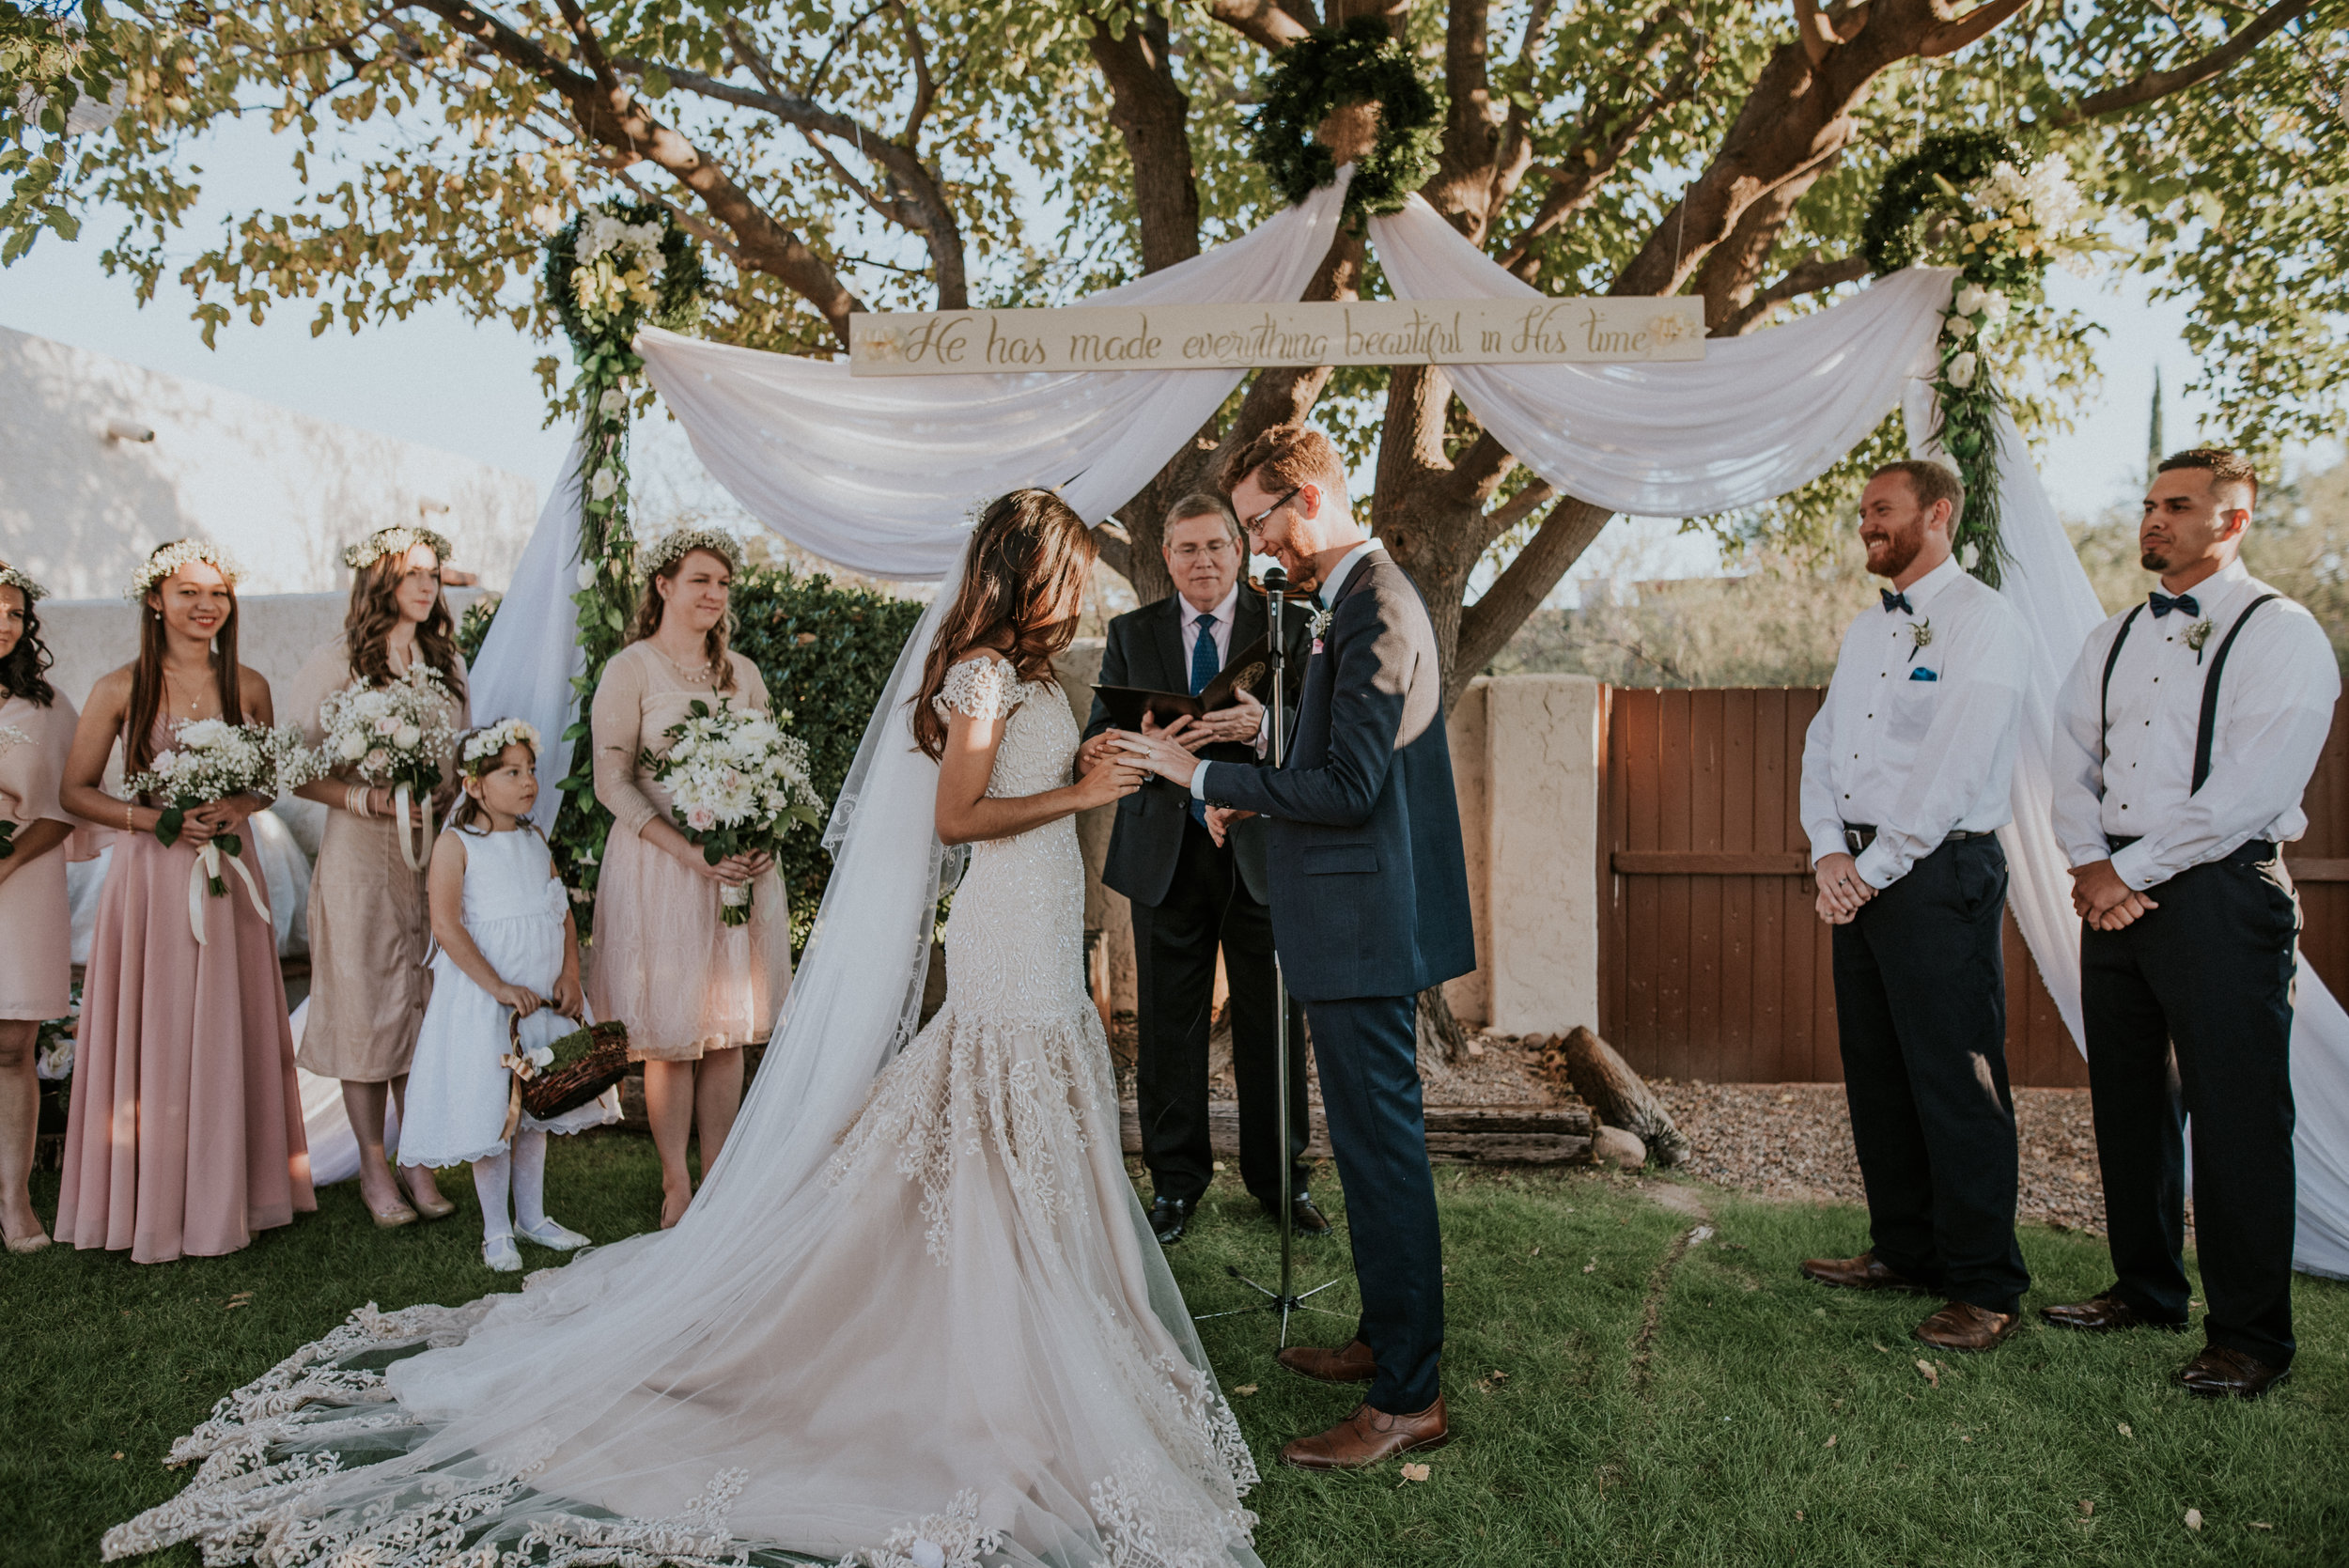 Tucson Intimate DIY Backyard Wedding_-16.jpg